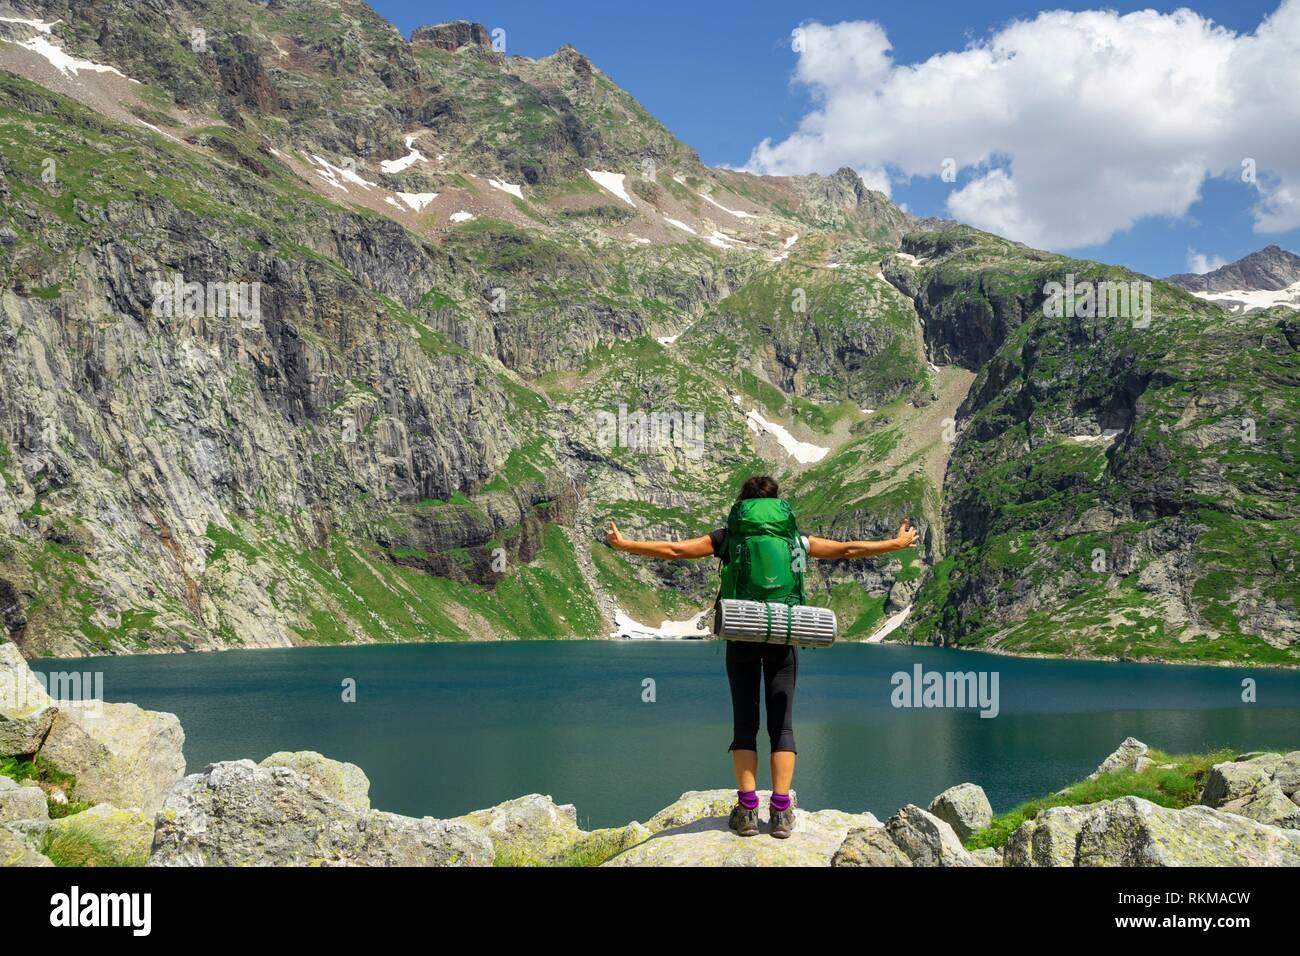 trekker, lago de Caillouas, Gourgs Blancs, cordillera de los Pirineos, France. - Stock Image